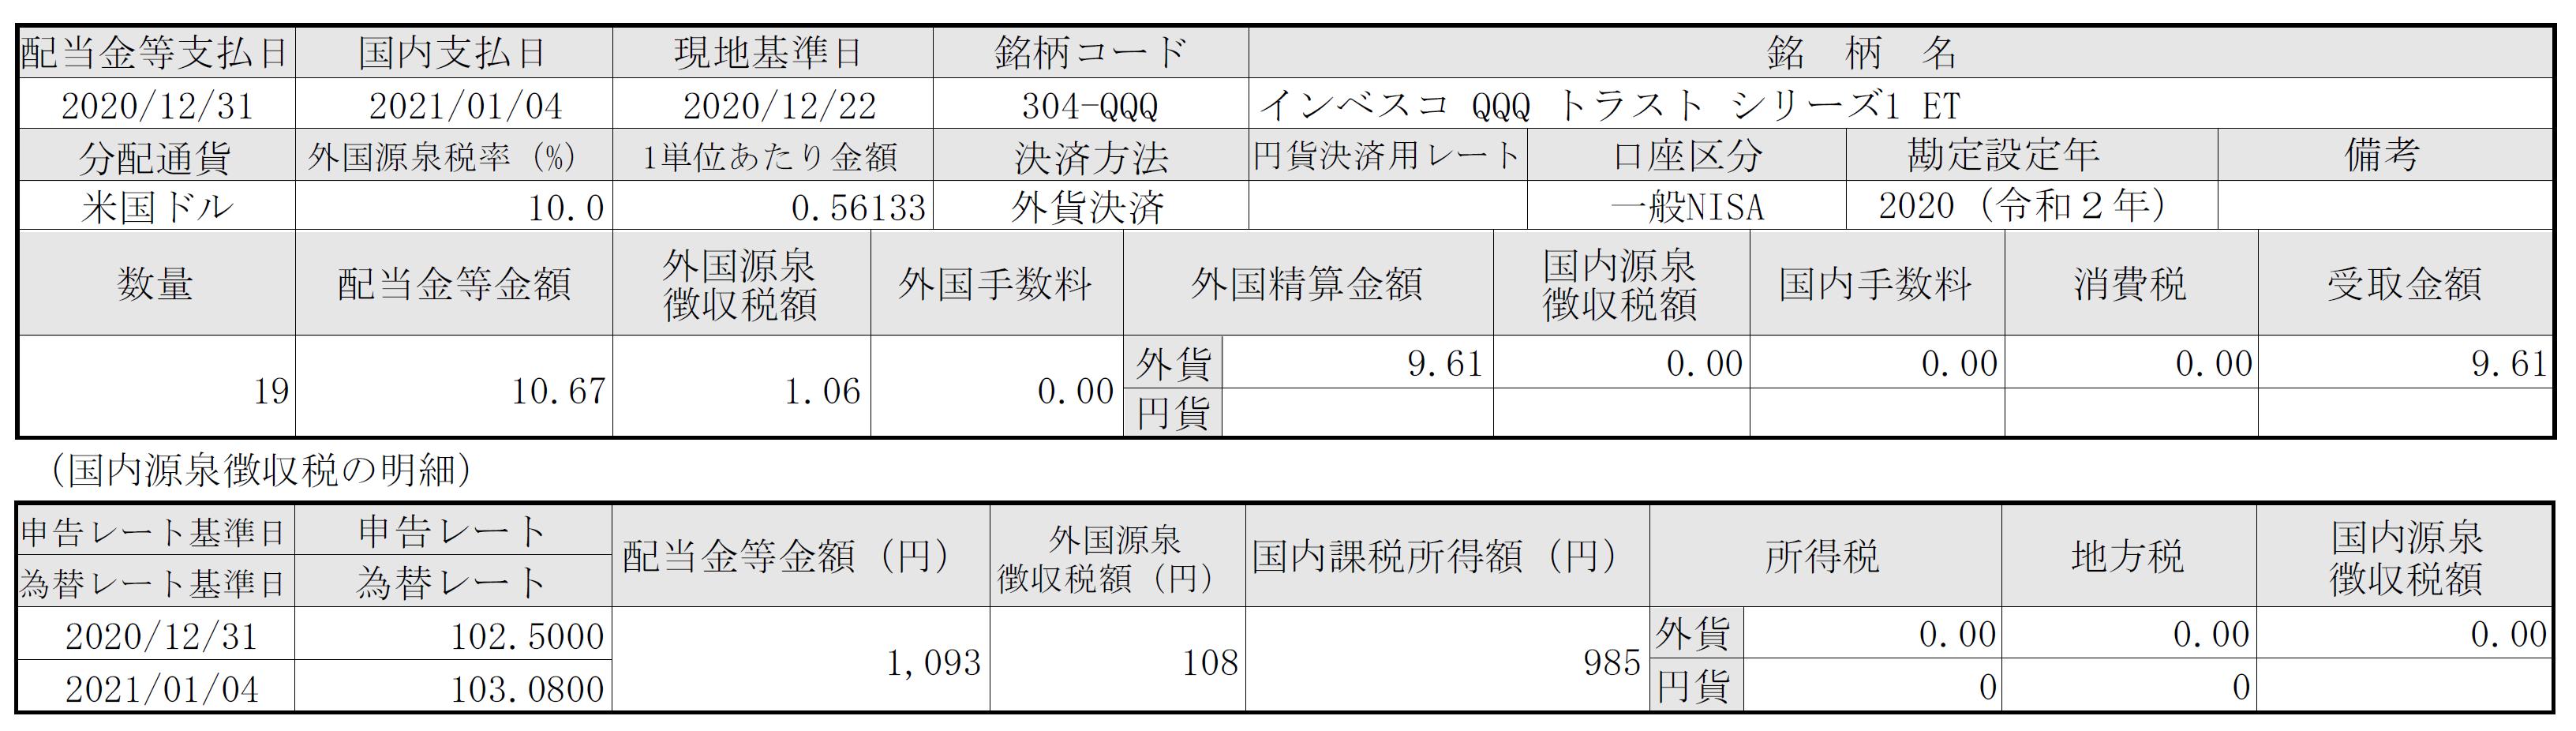 f:id:hodo-work:20210112115237p:plain